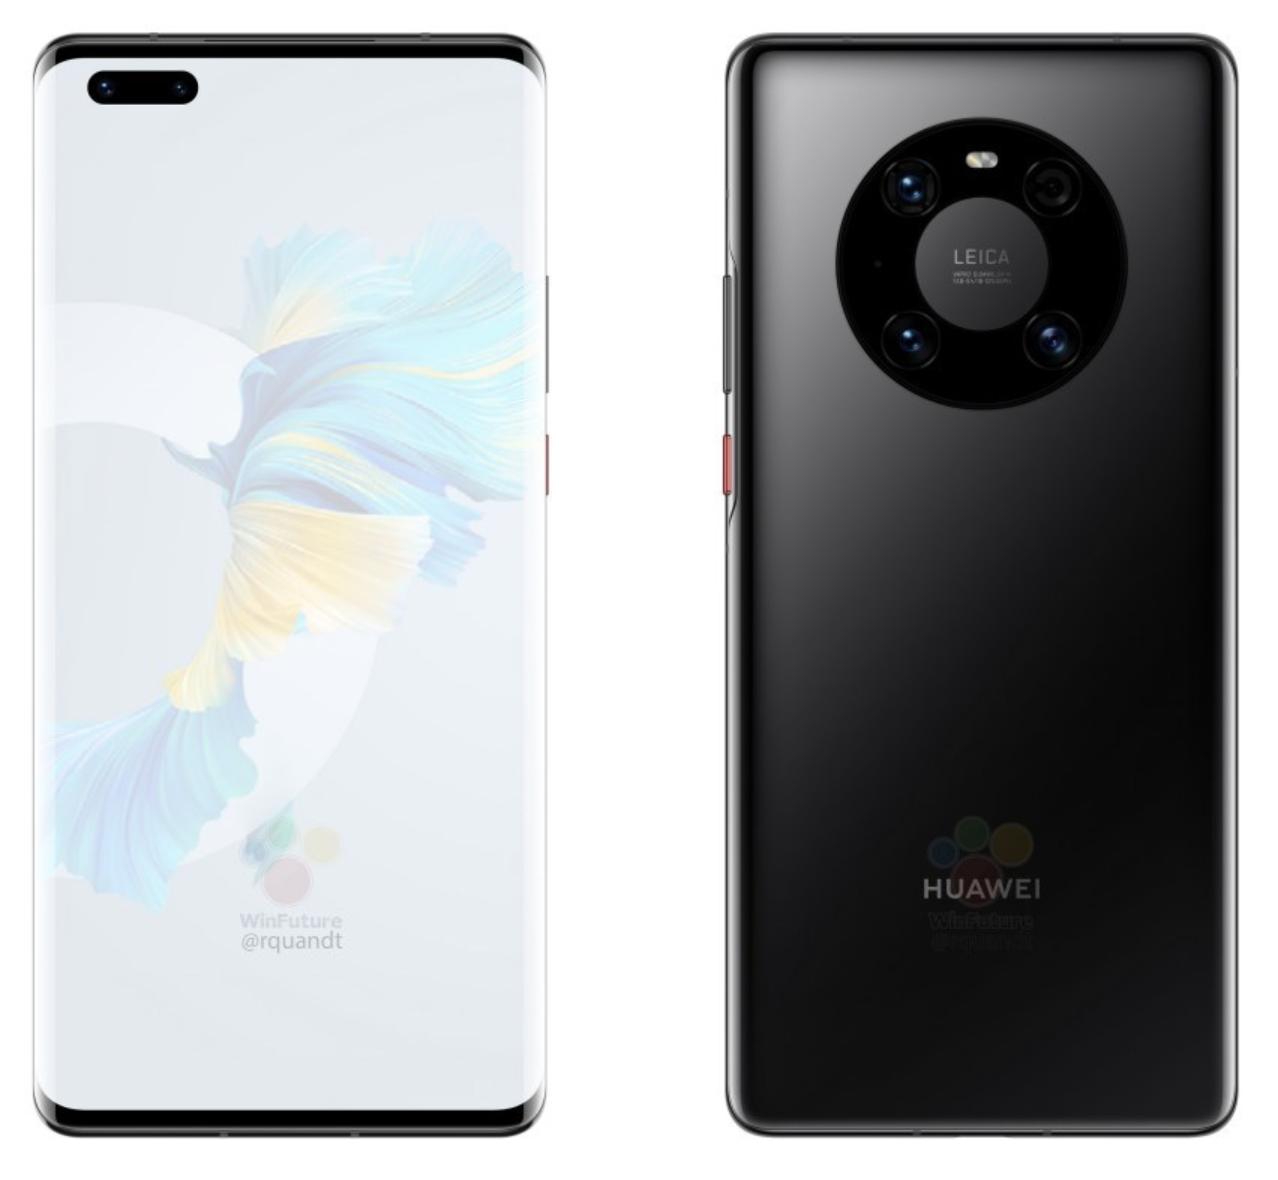 Musta Huawei Mate 40 Pro. Kuva: WinFuture.de / Roland Quandt.